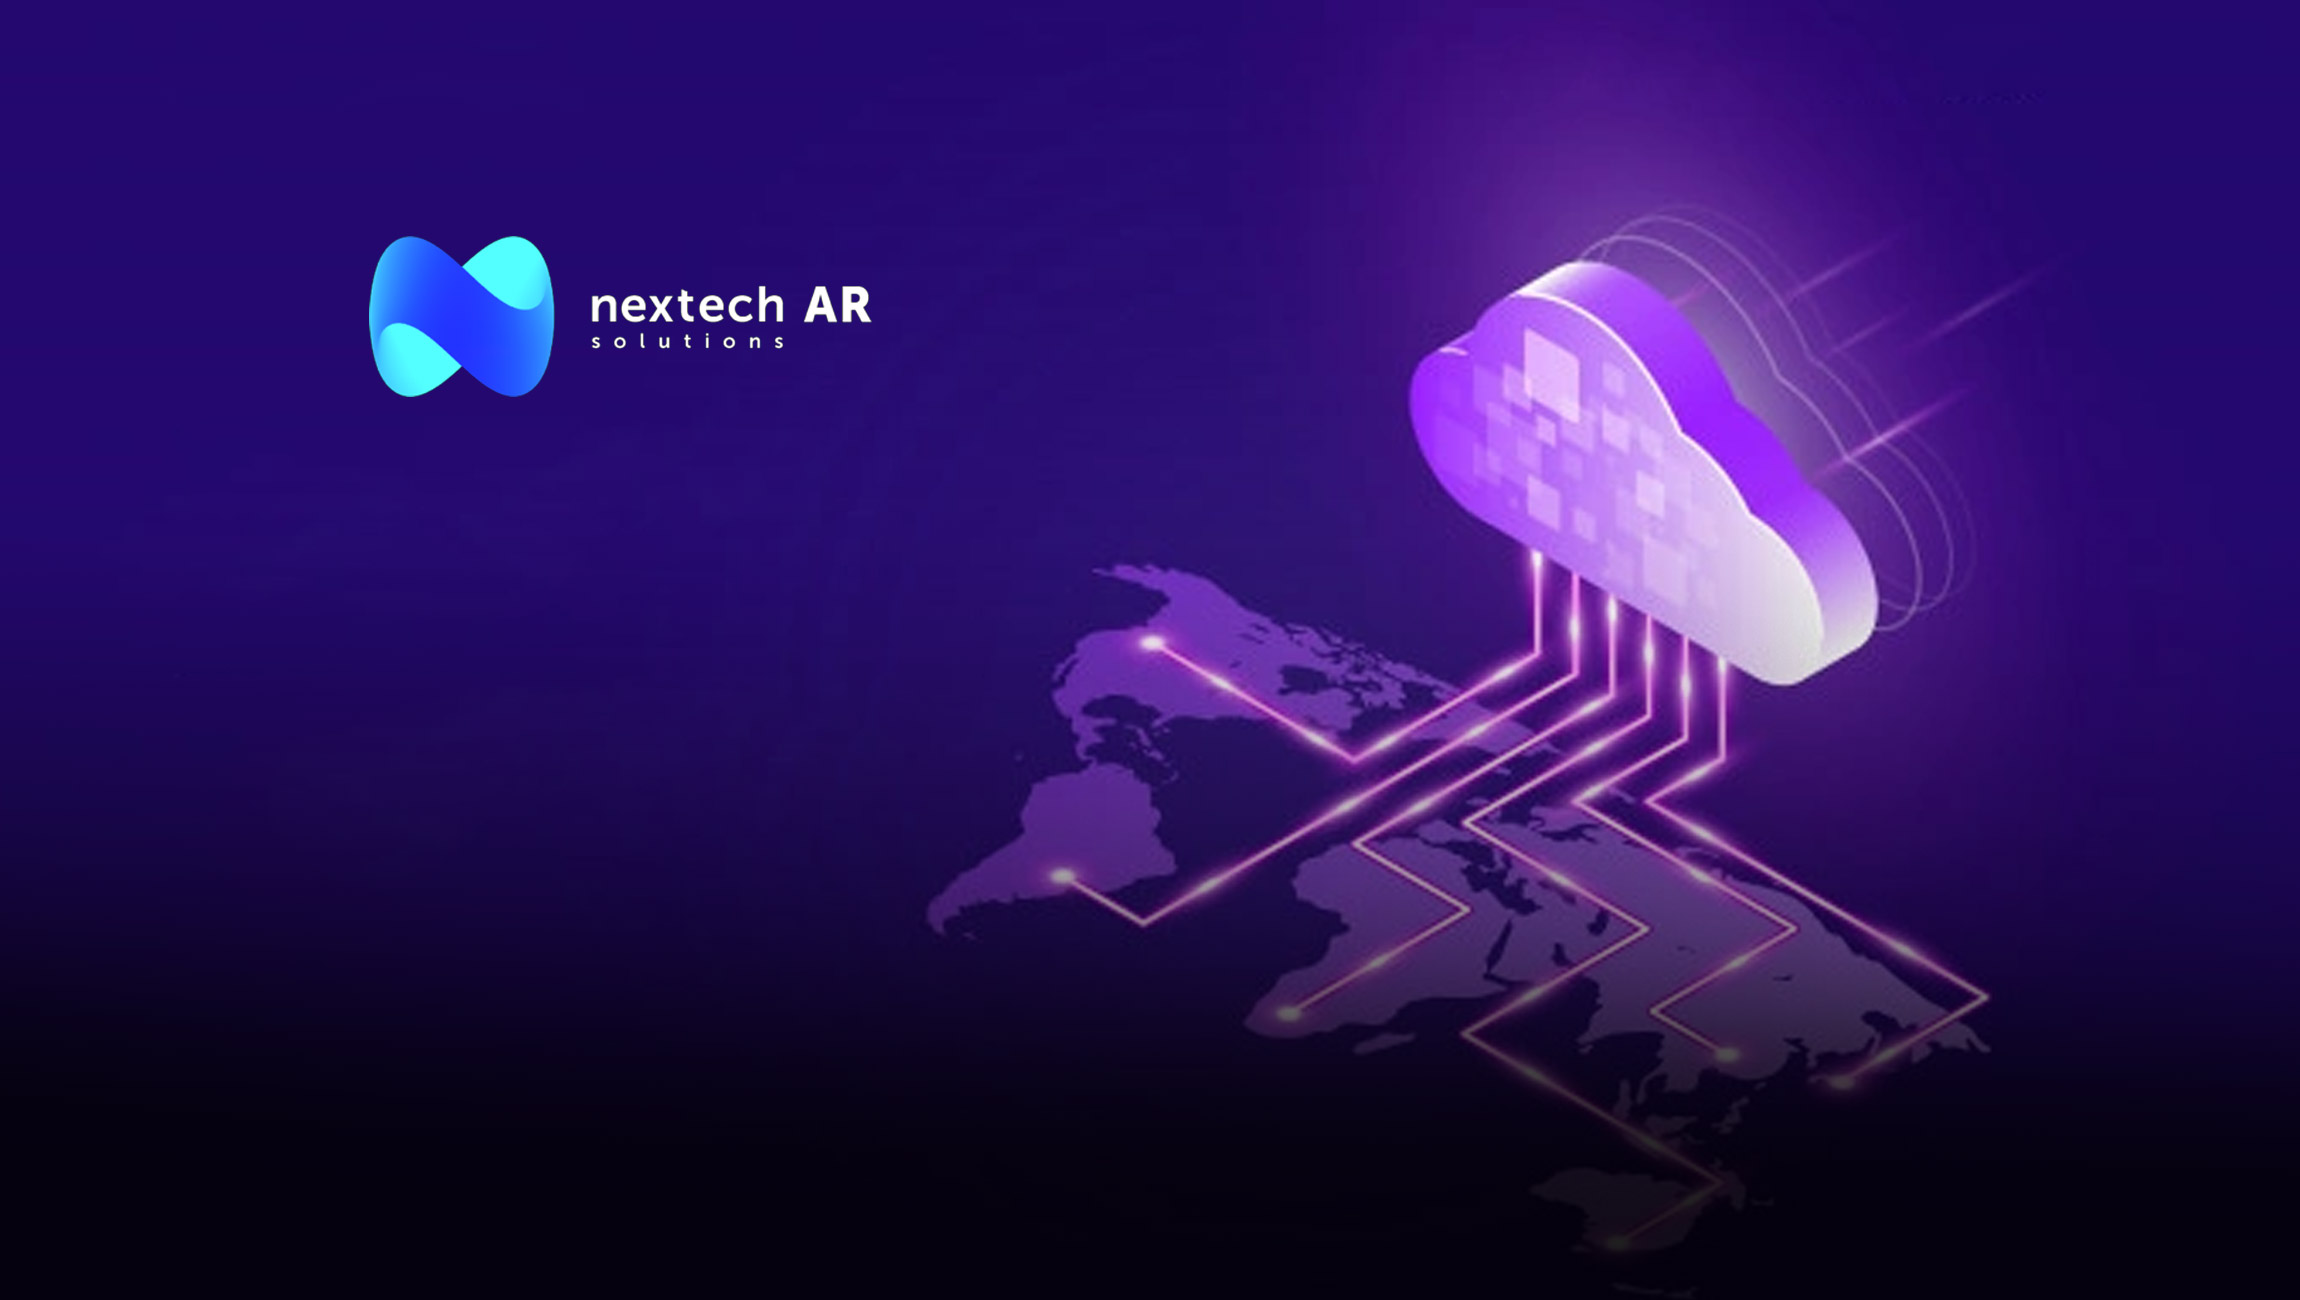 Nextech-AR-Integrates-Microsoft-Azure-Cloud-Computing-Platform